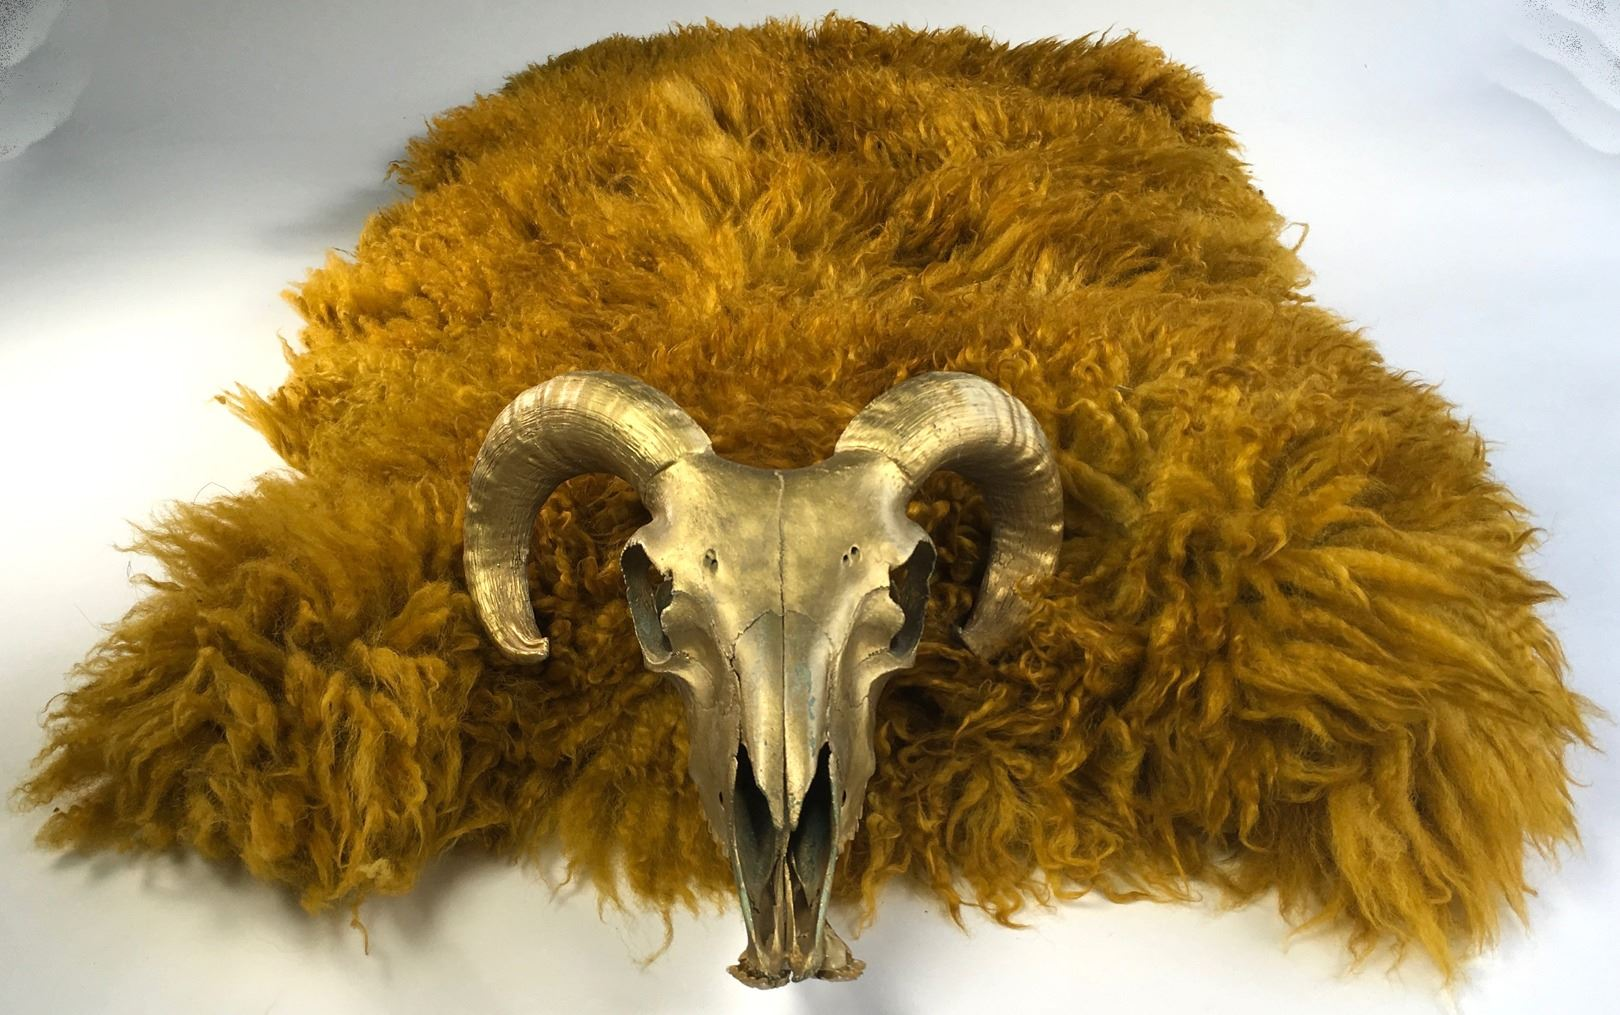 """Rumplestiltskin"" gold ram's skull and golden fleece from Once Upon a Time  Season 2, Episode 19"